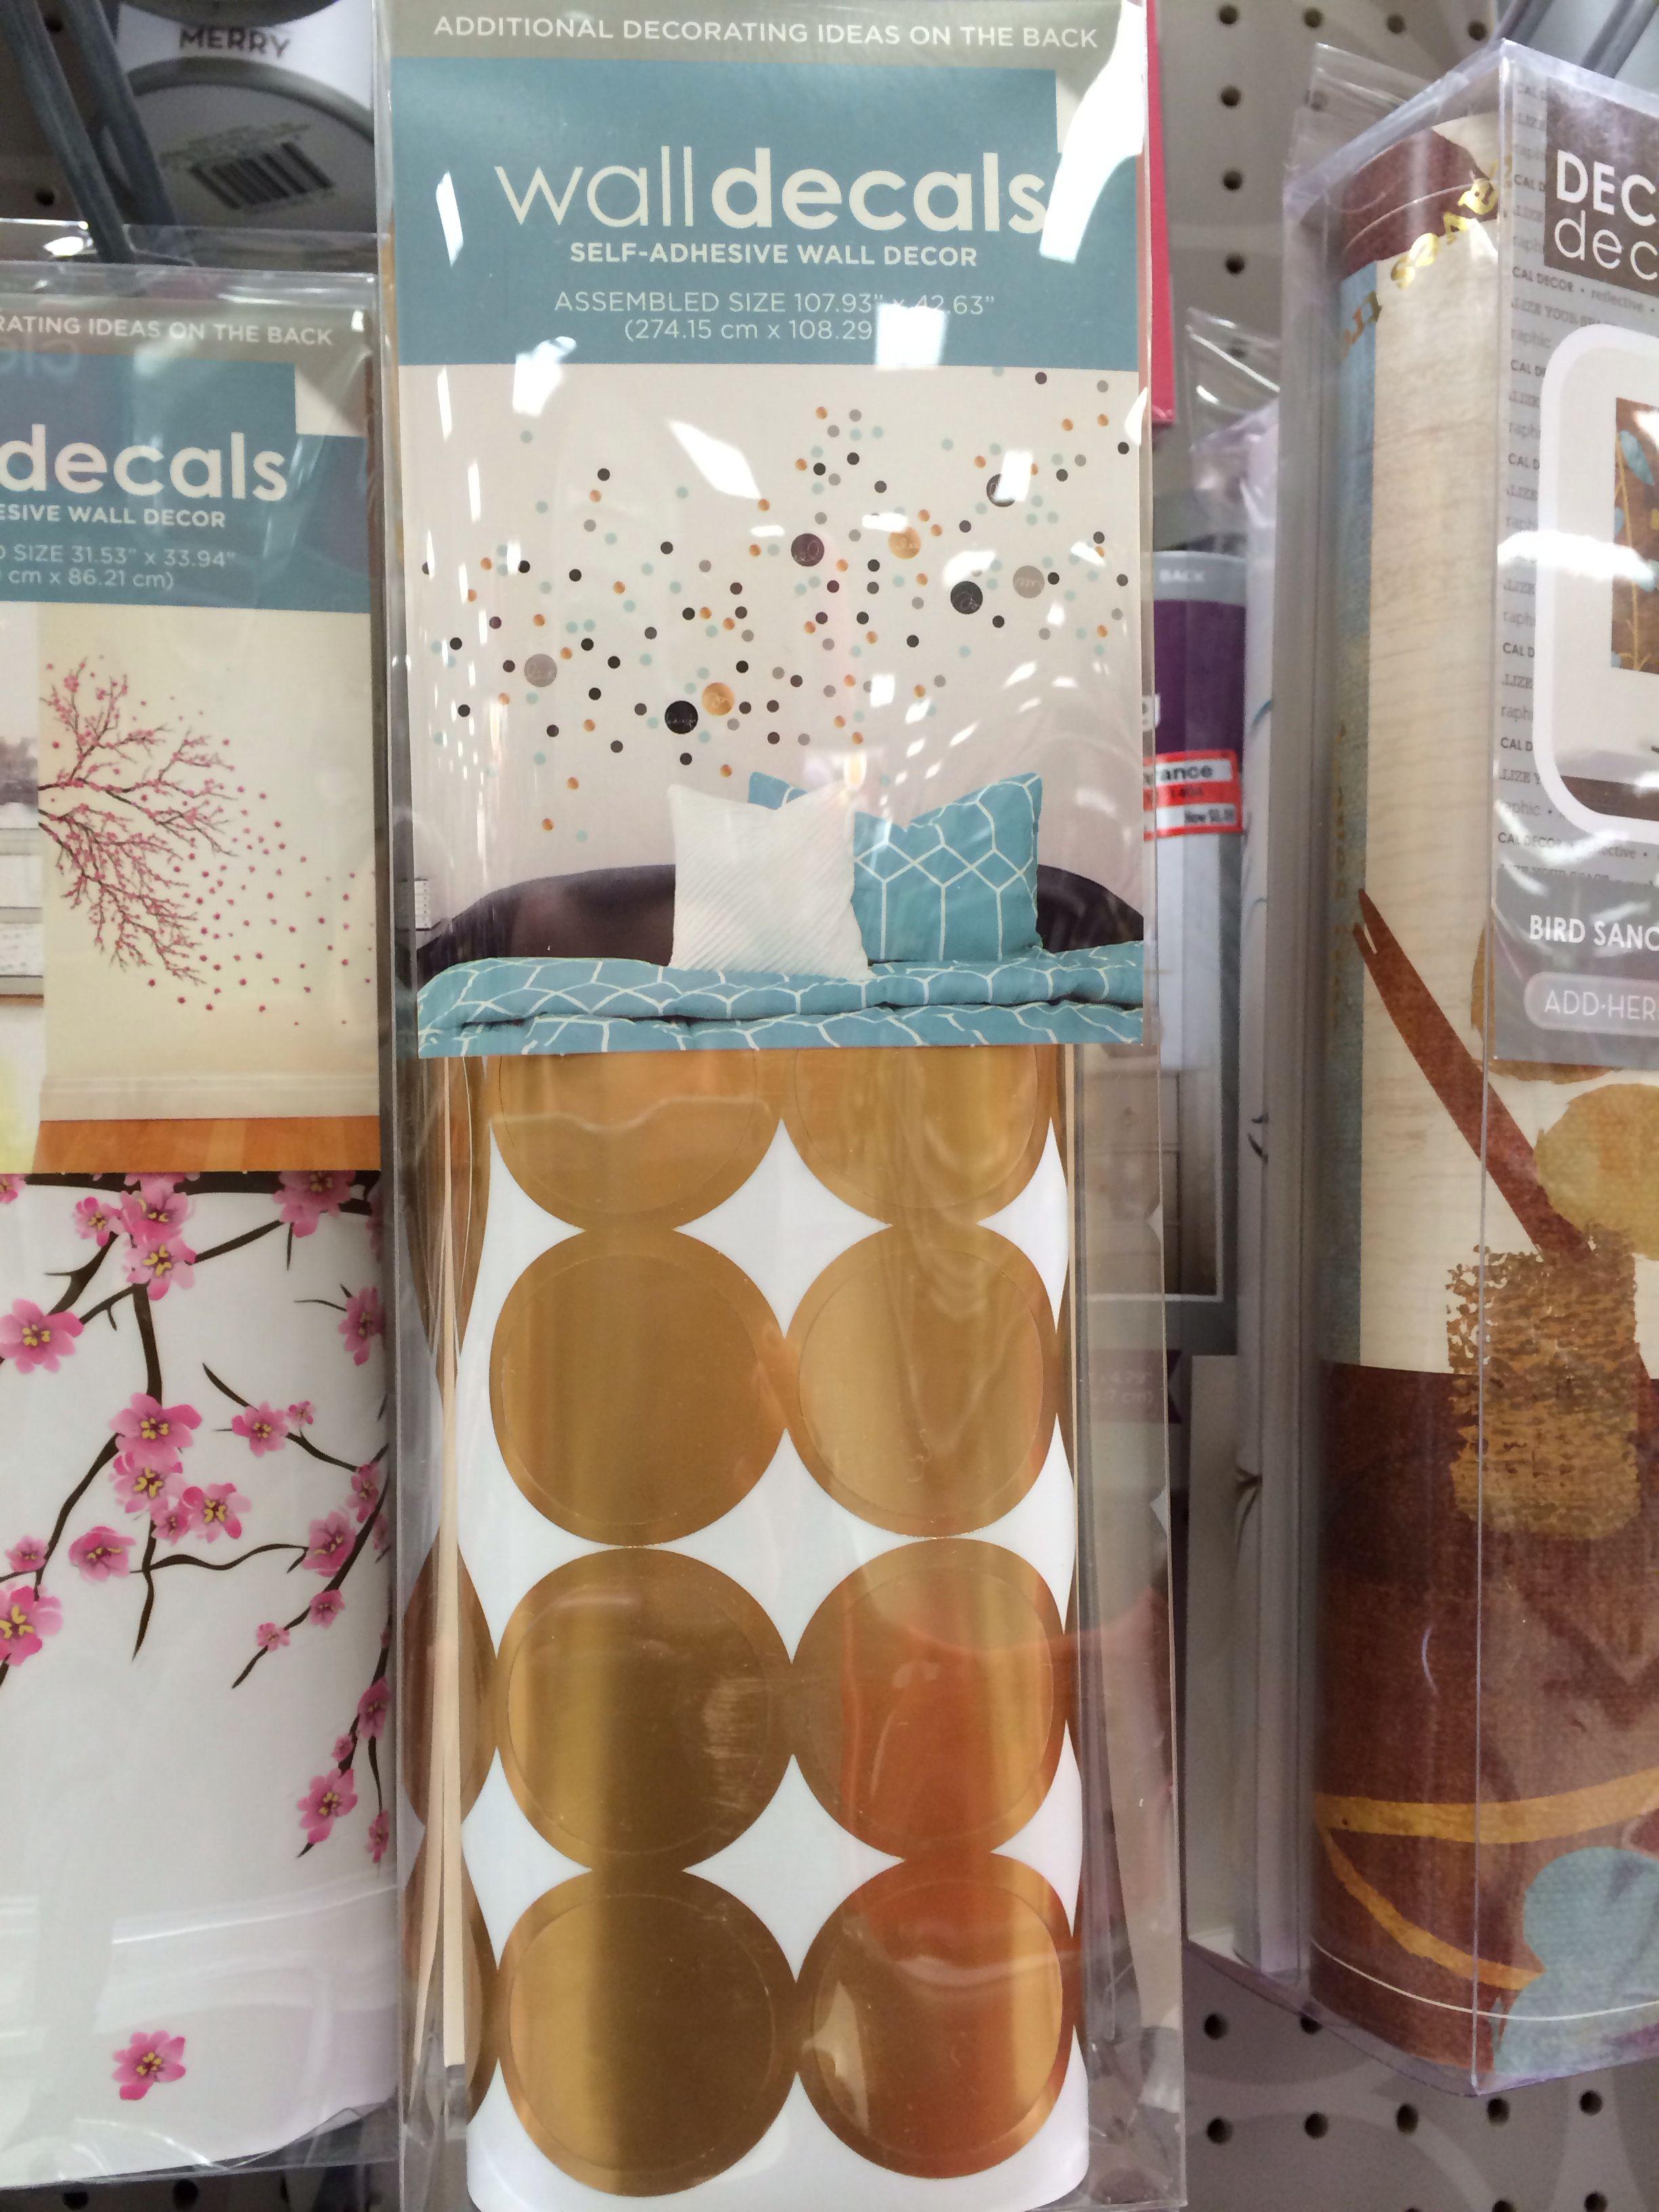 Gold Dot Wall Decals At Target! Part 75